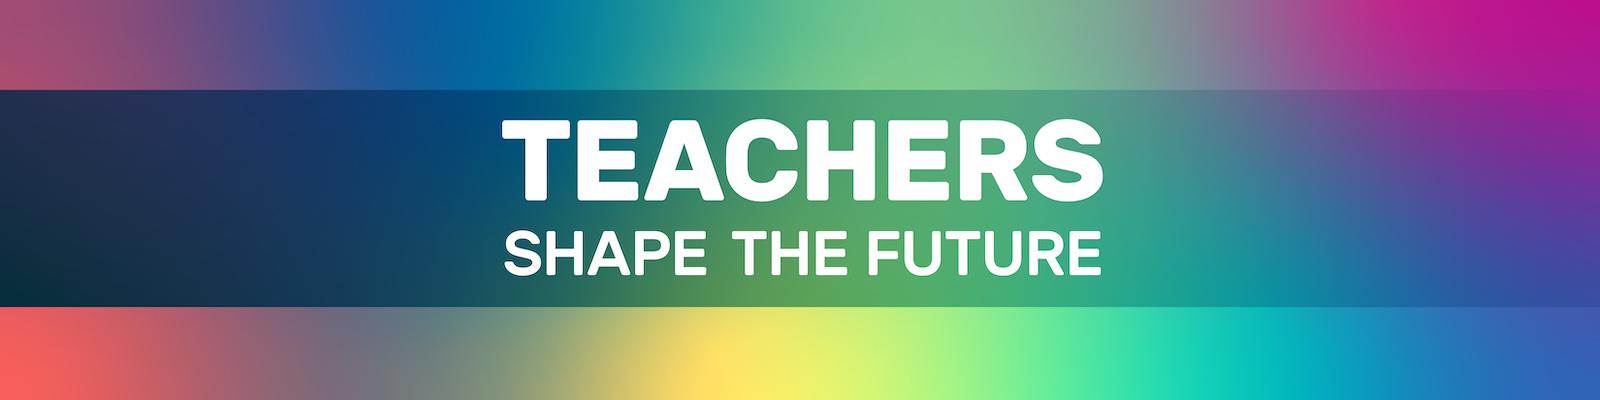 "A LinkedIn cover image that says, ""Teachers Shape the Future"""